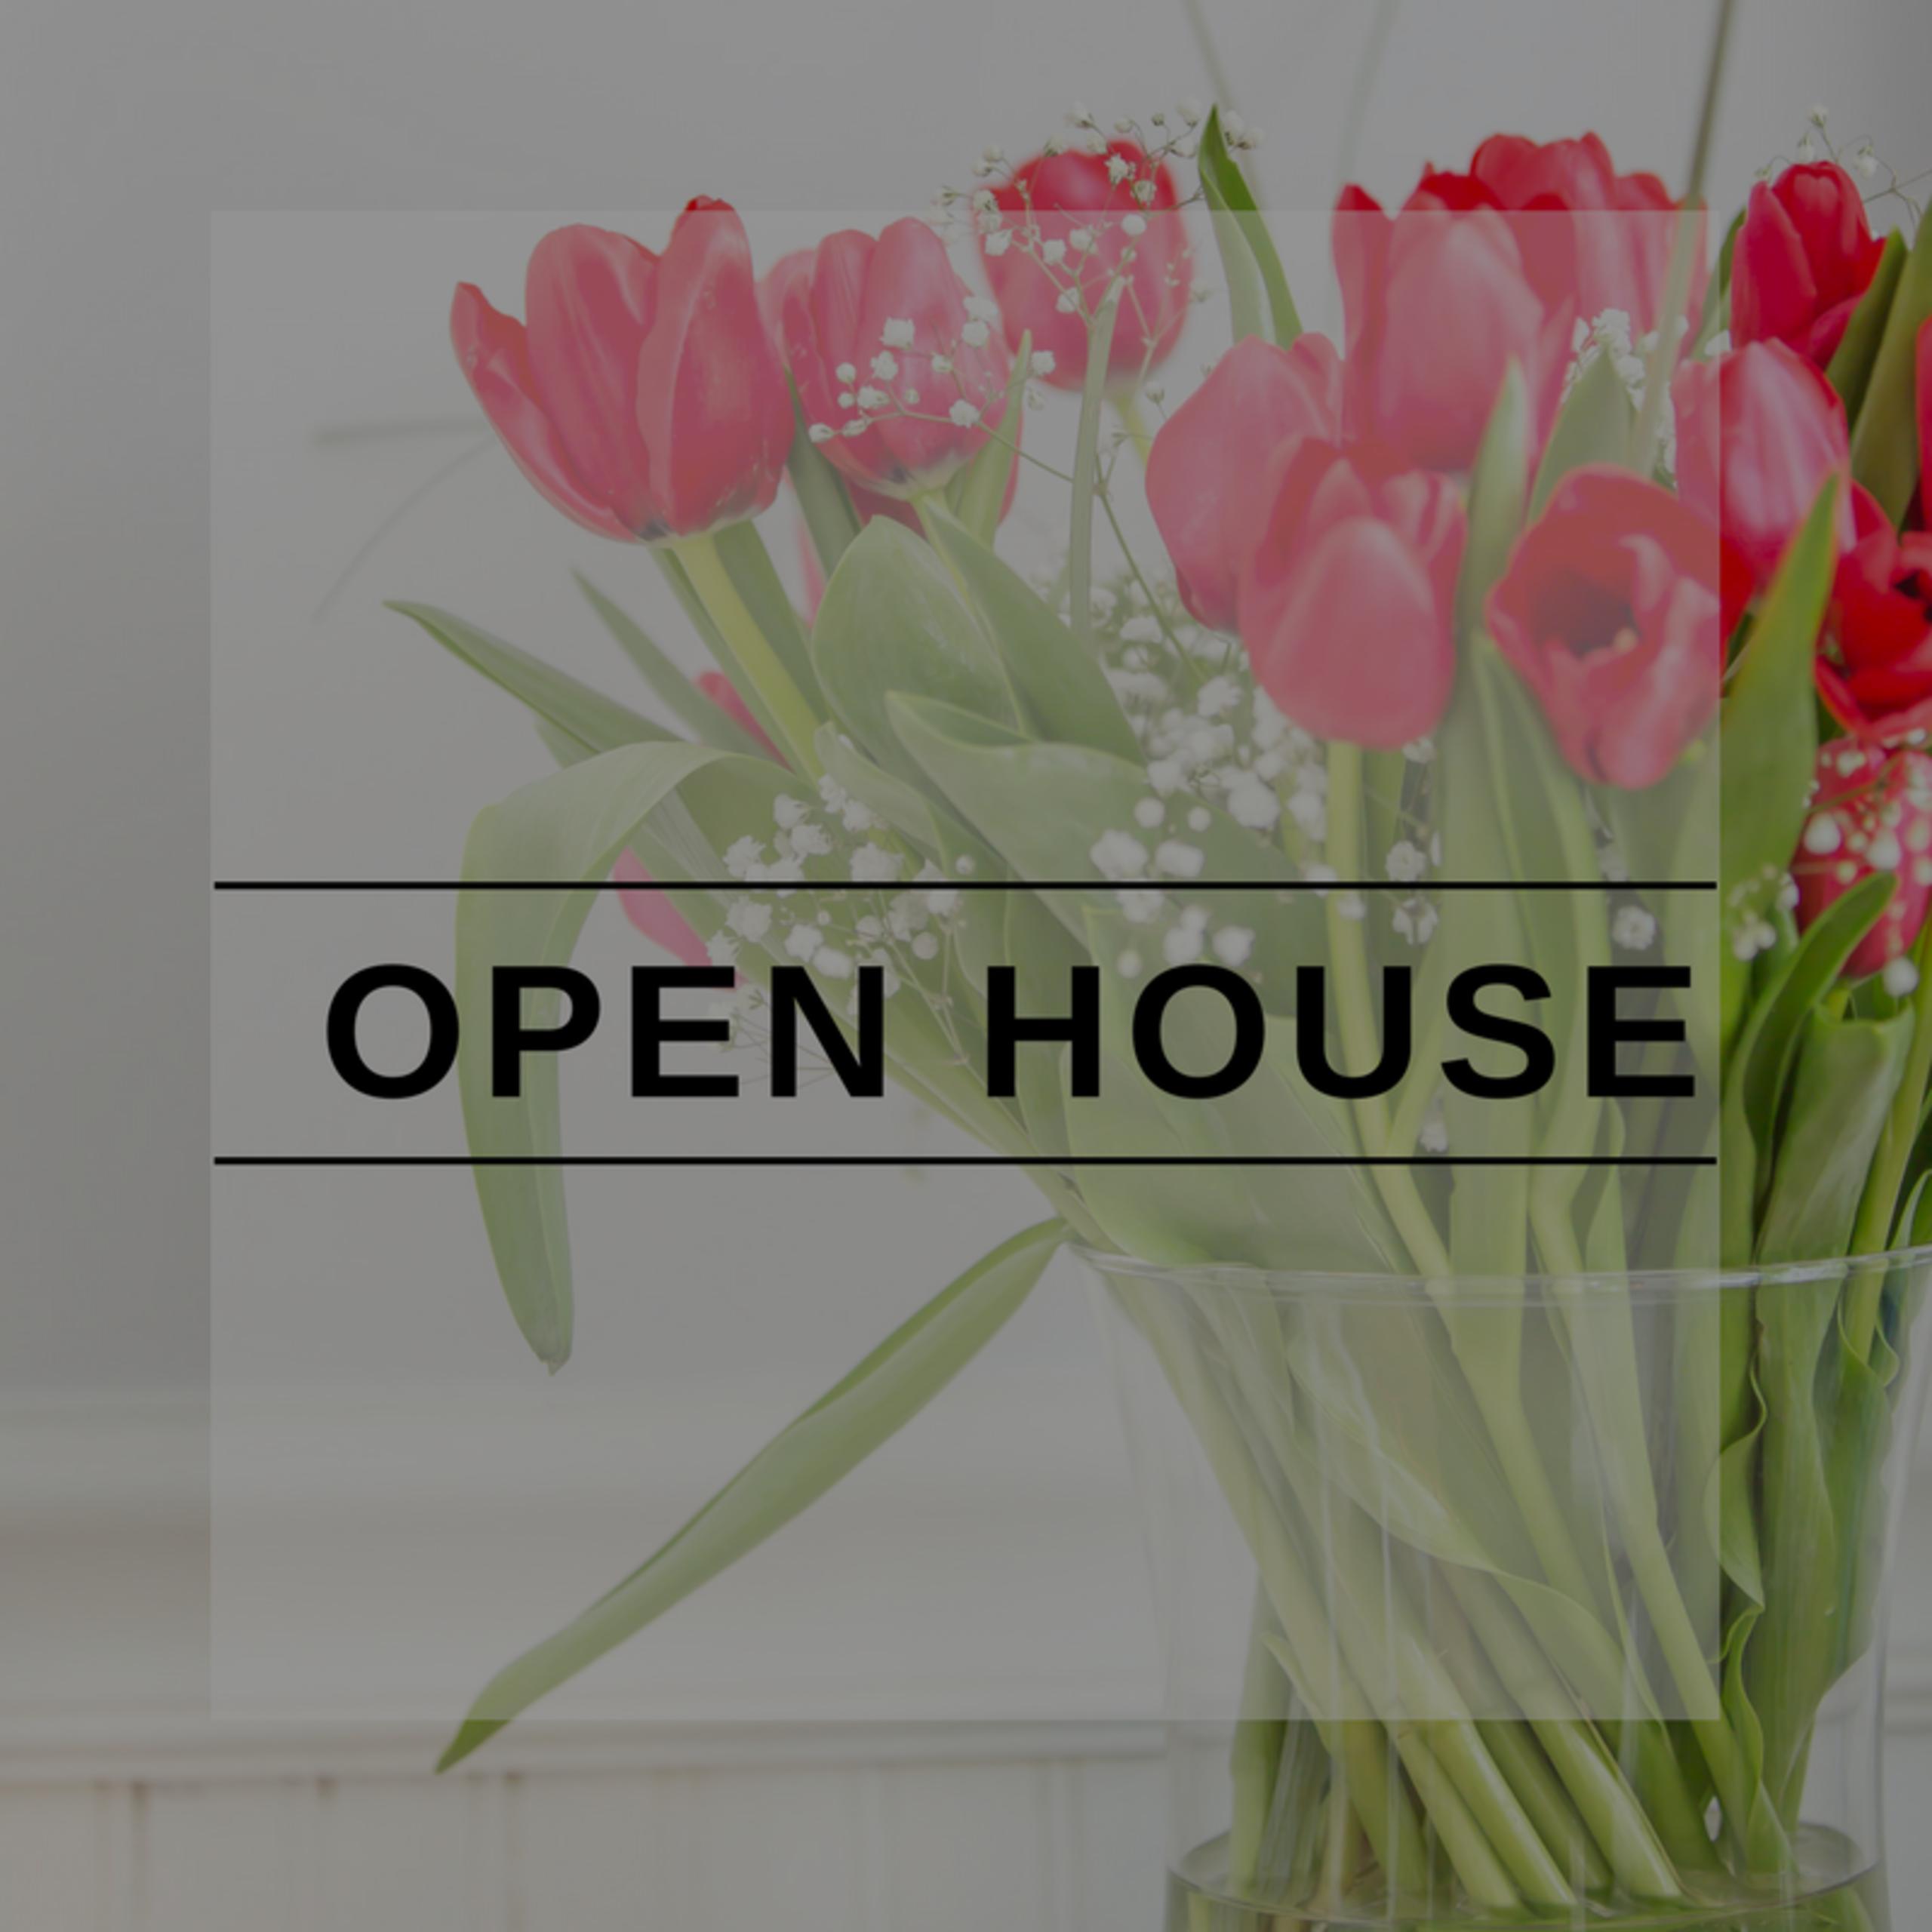 OPEN HOUSE LIST 3/24/18 – 3/25/18